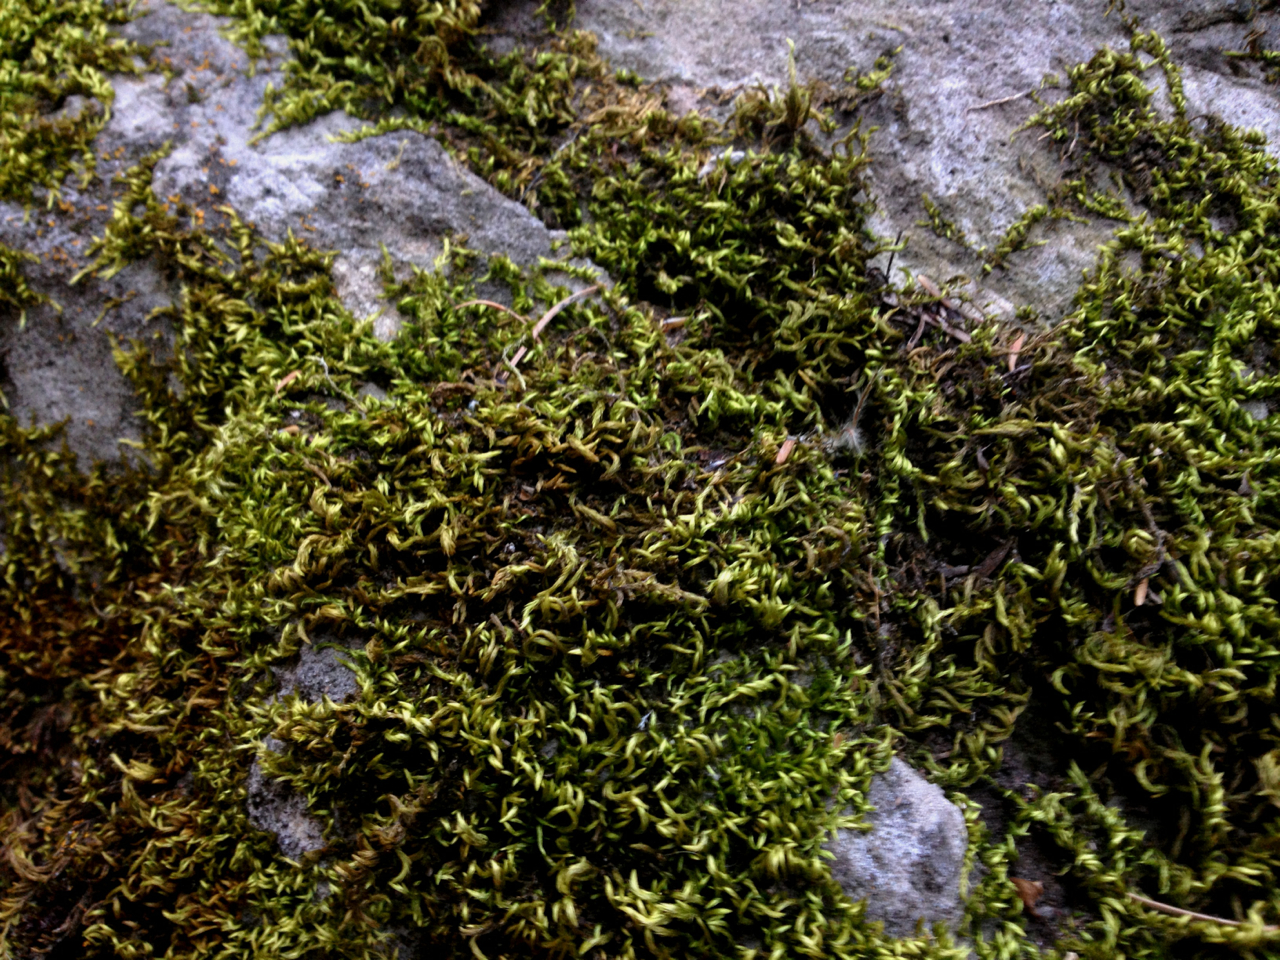 Mossy. Millcreek Canyon